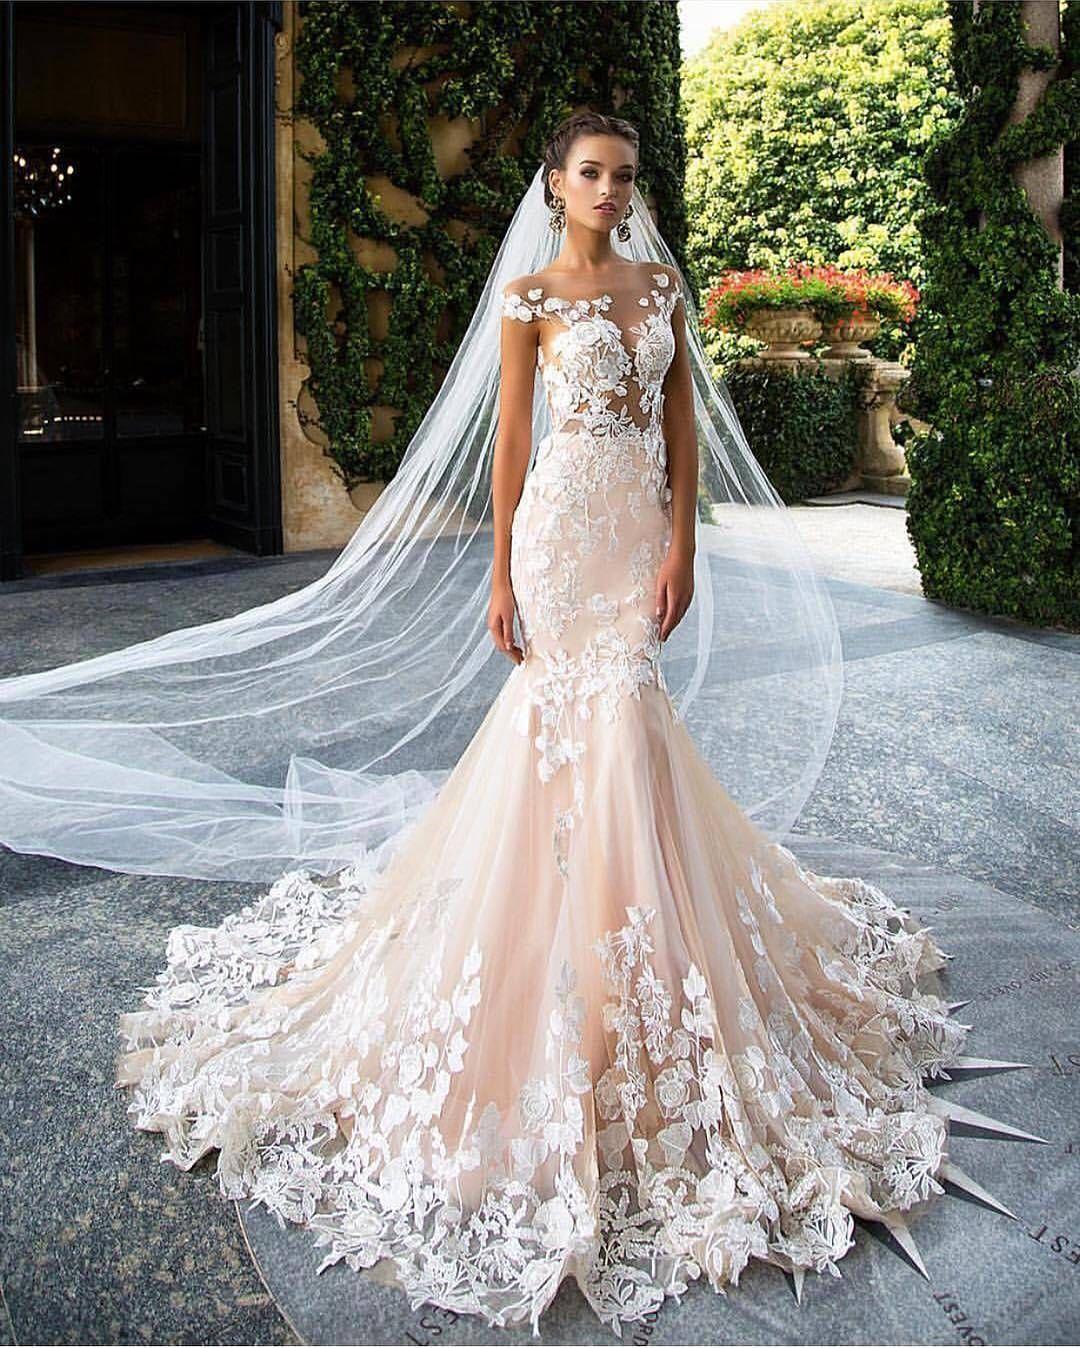 Lace dress roblox  Gorgeous weddingdress from the amazing nasmoda      xo